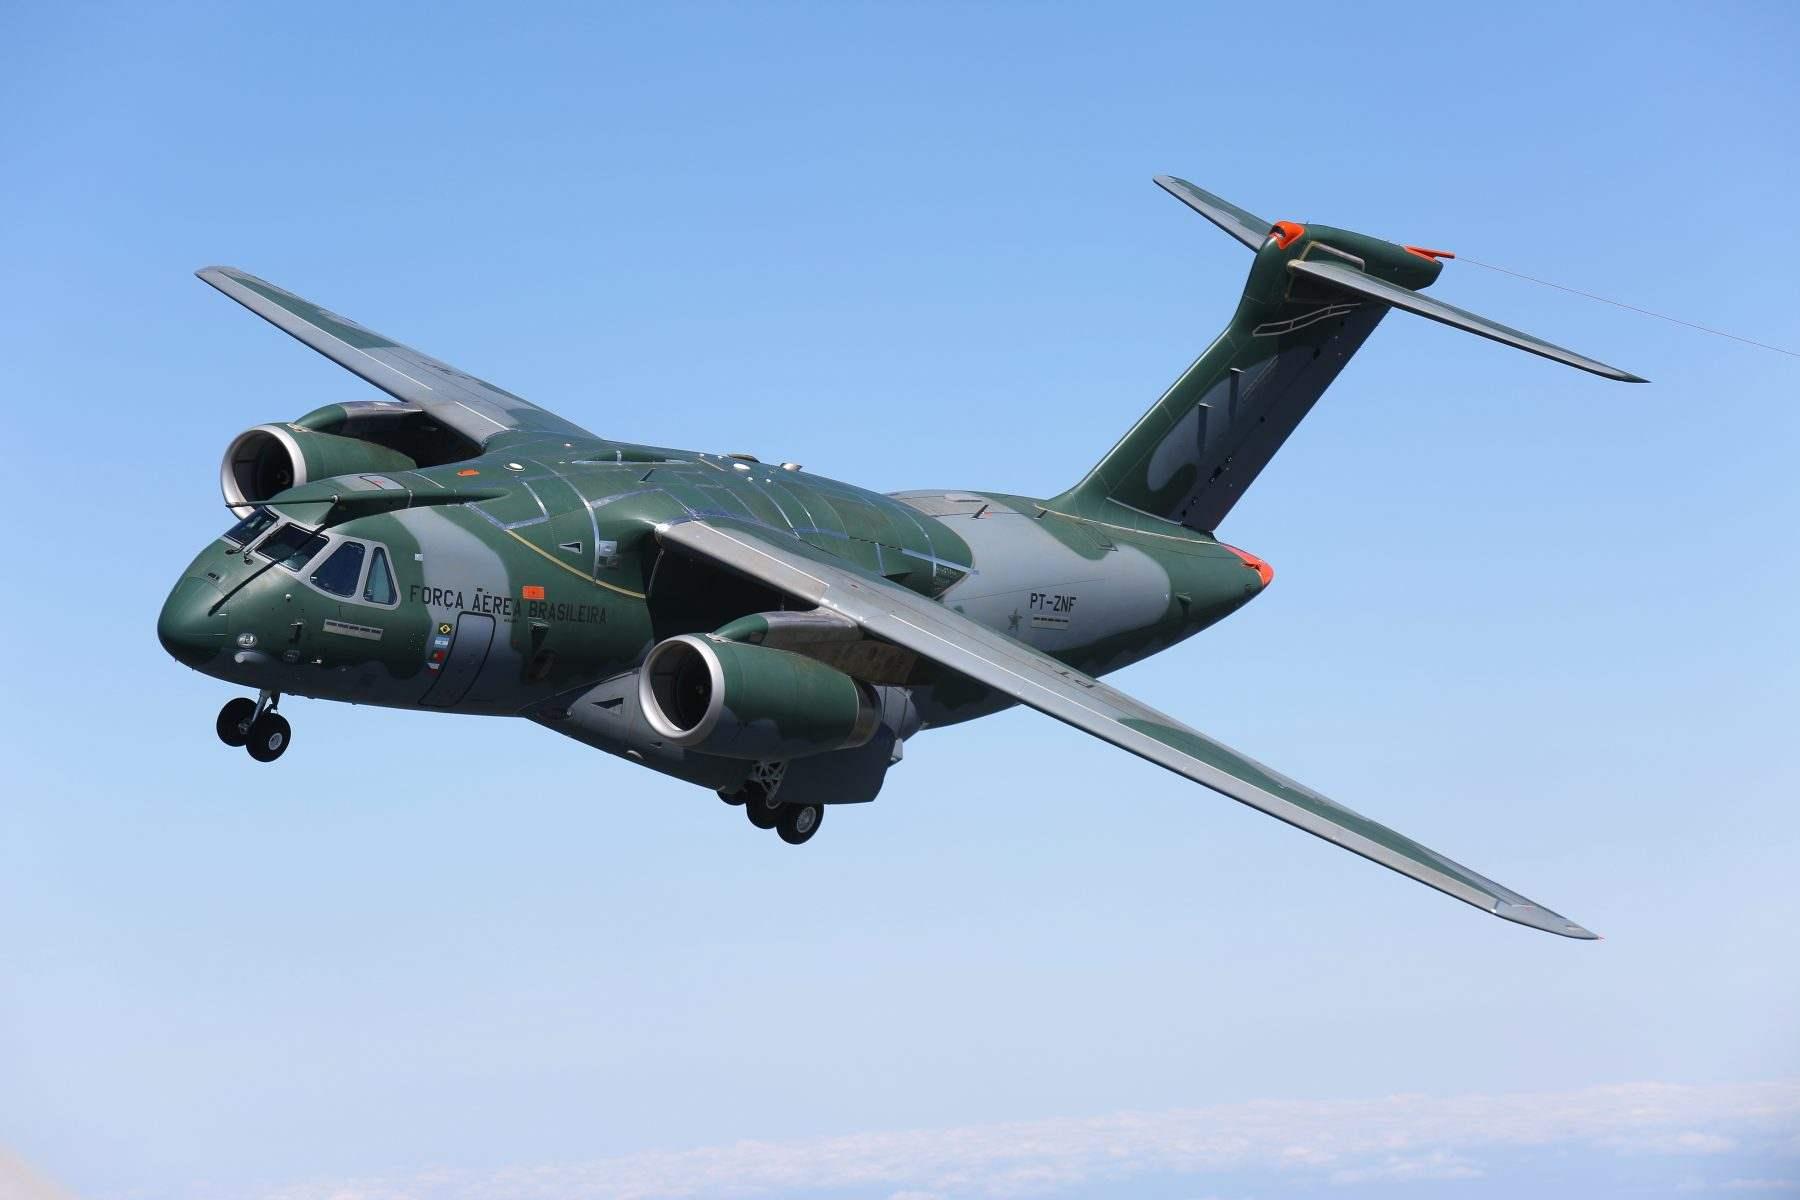 Embraer anuncia joint venture com Boeing para promover C-390 Millennium